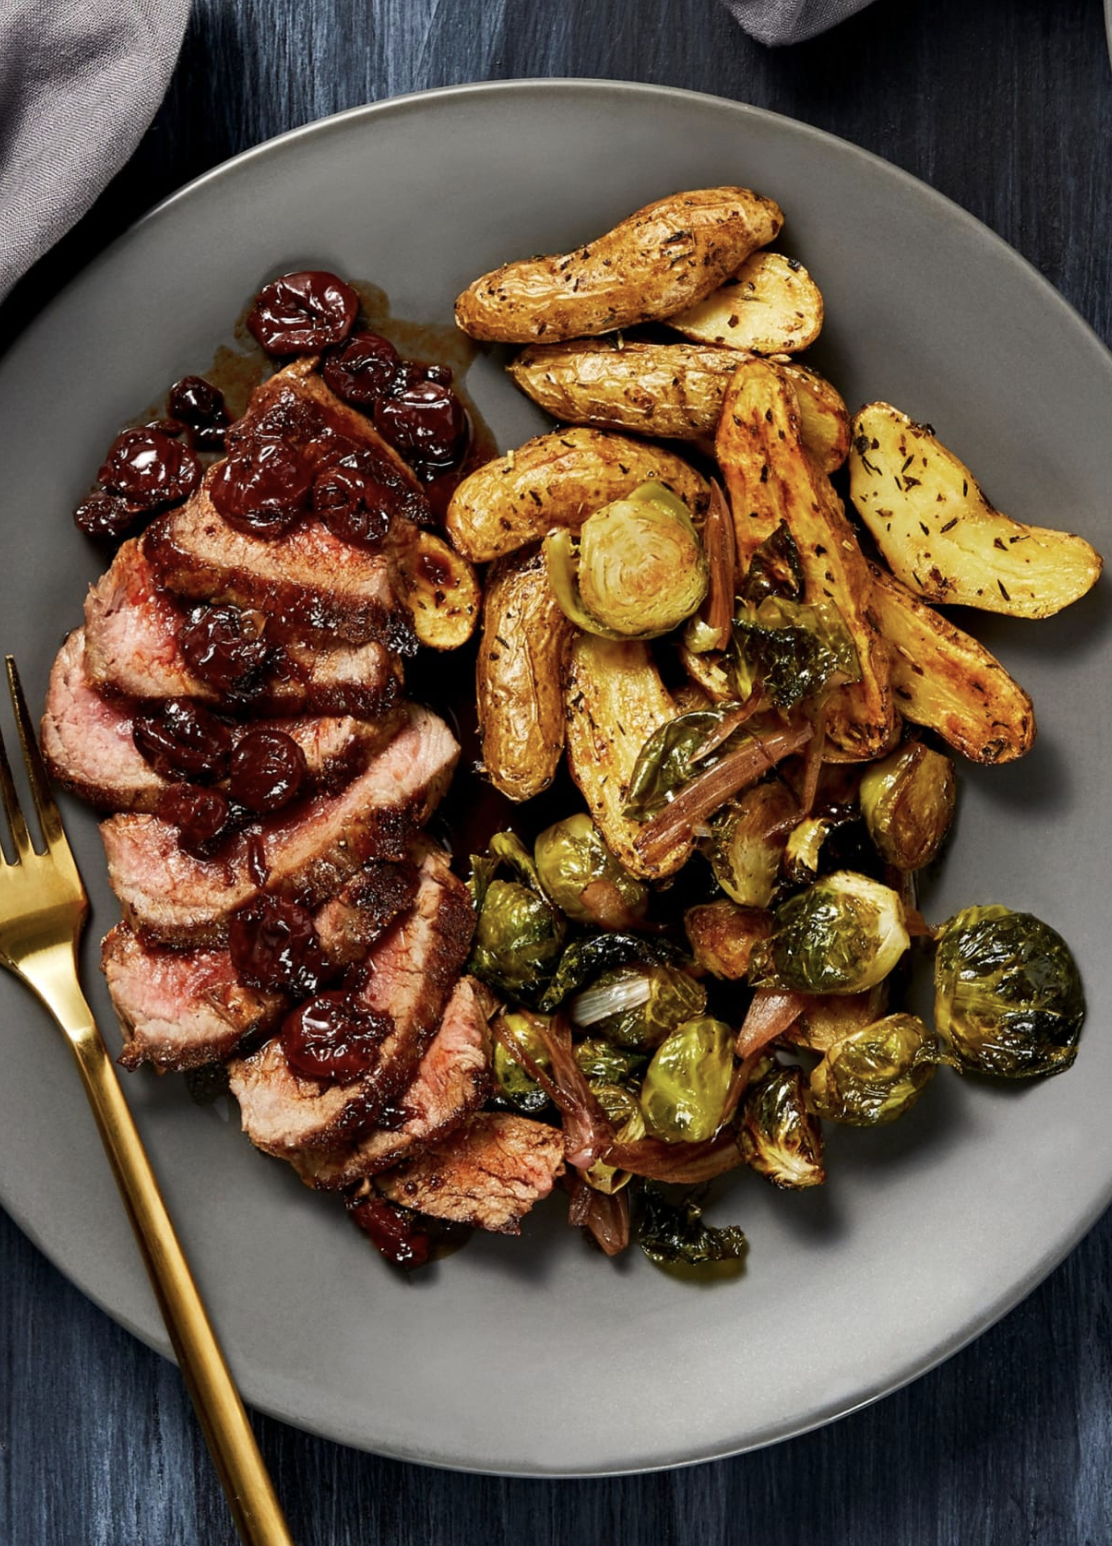 Cherry Balsamic Steak Recipe Hellofresh Recipe Hello Fresh Recipes Gourmet Dinner Recipes Healthy Gourmet